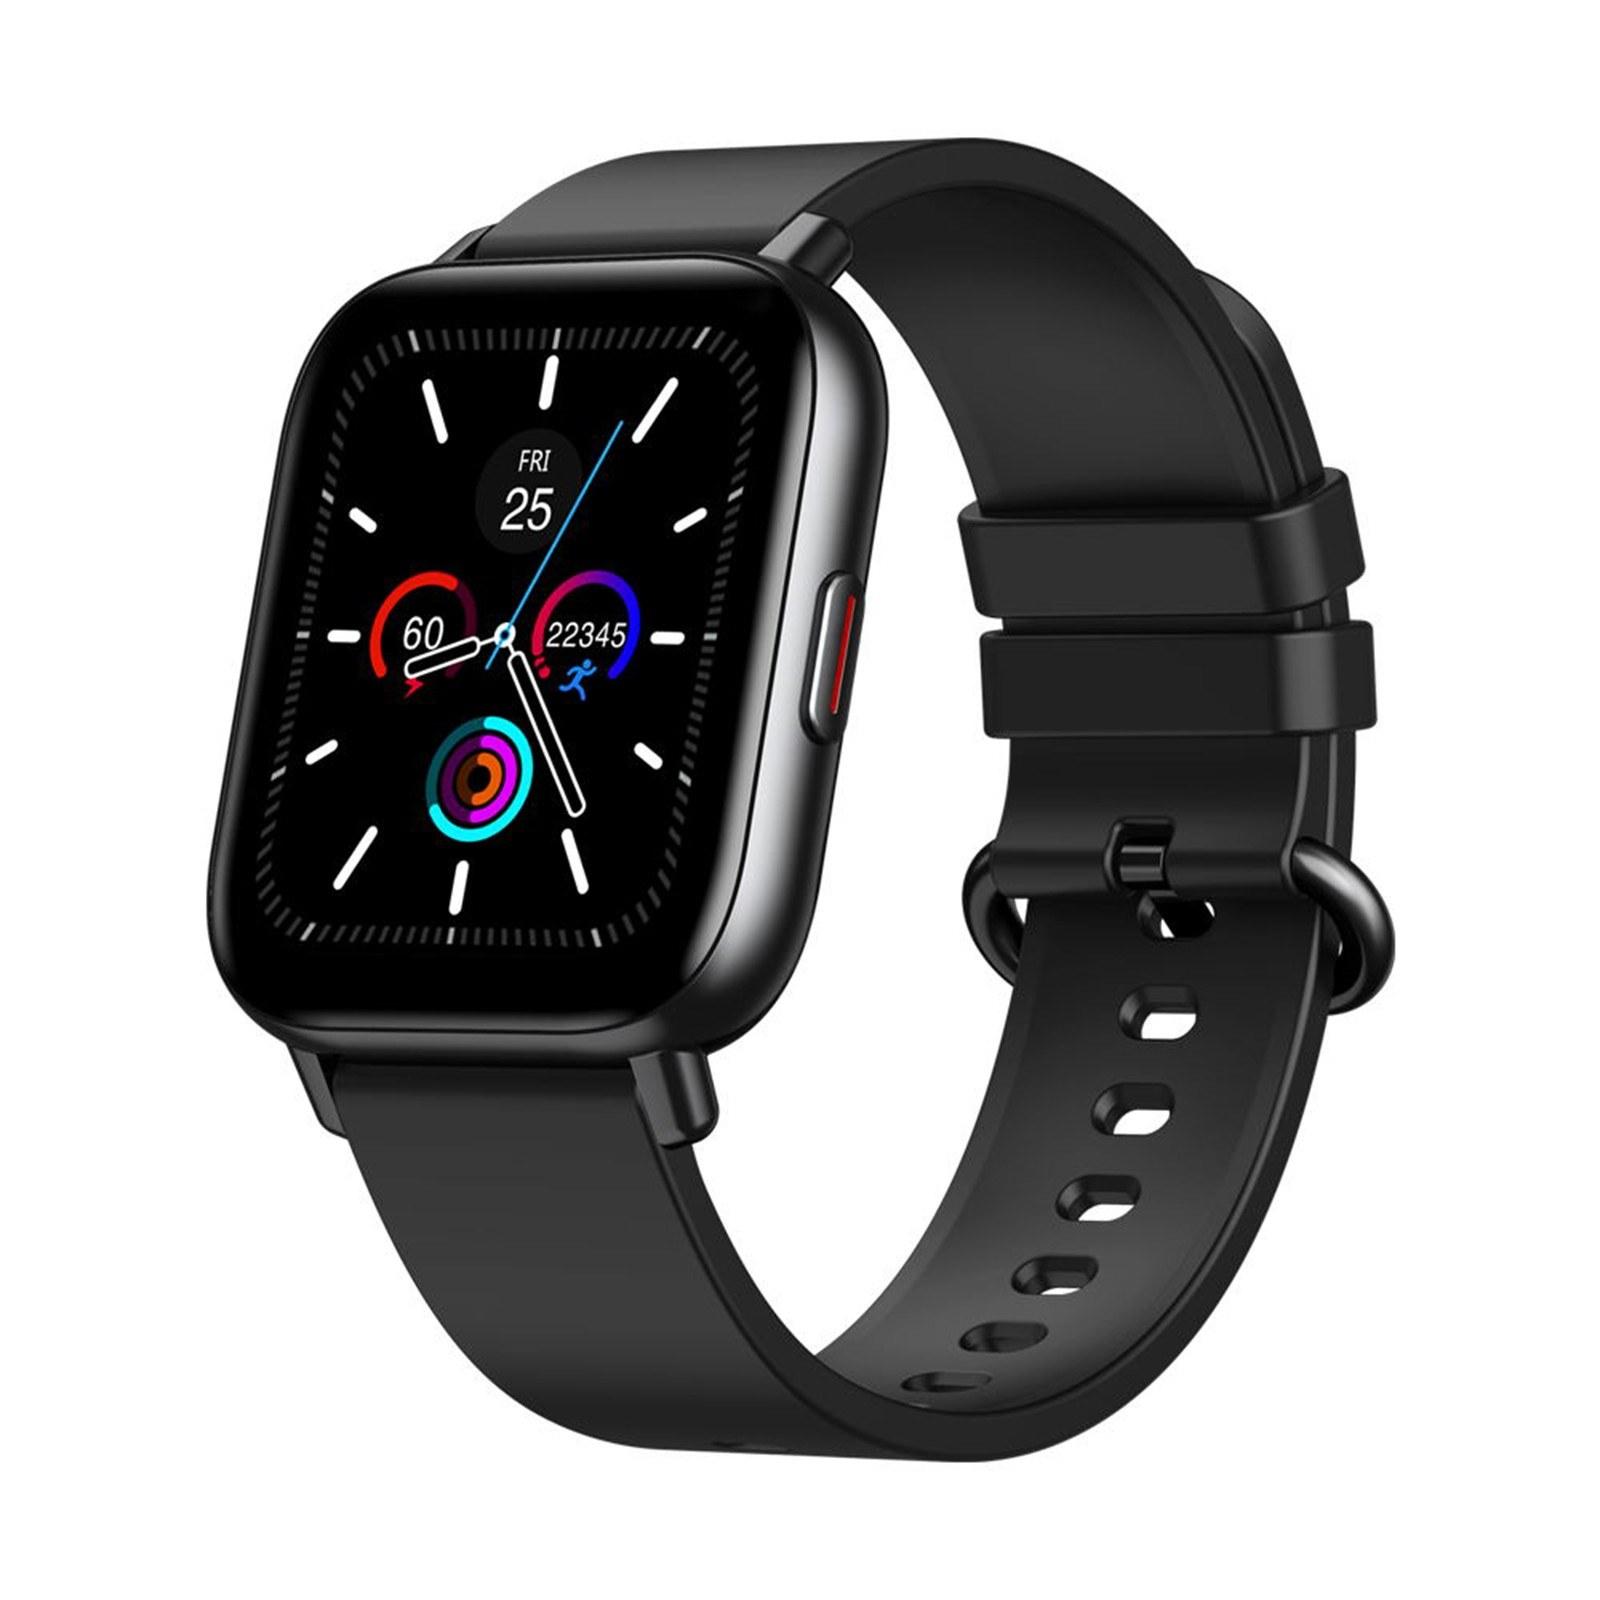 cafago.com - 62% OFF Zeblaze GTS Pro 1.65-Inch TFT Screen Smart Bracelet Sports Watch,free shipping+$26.24